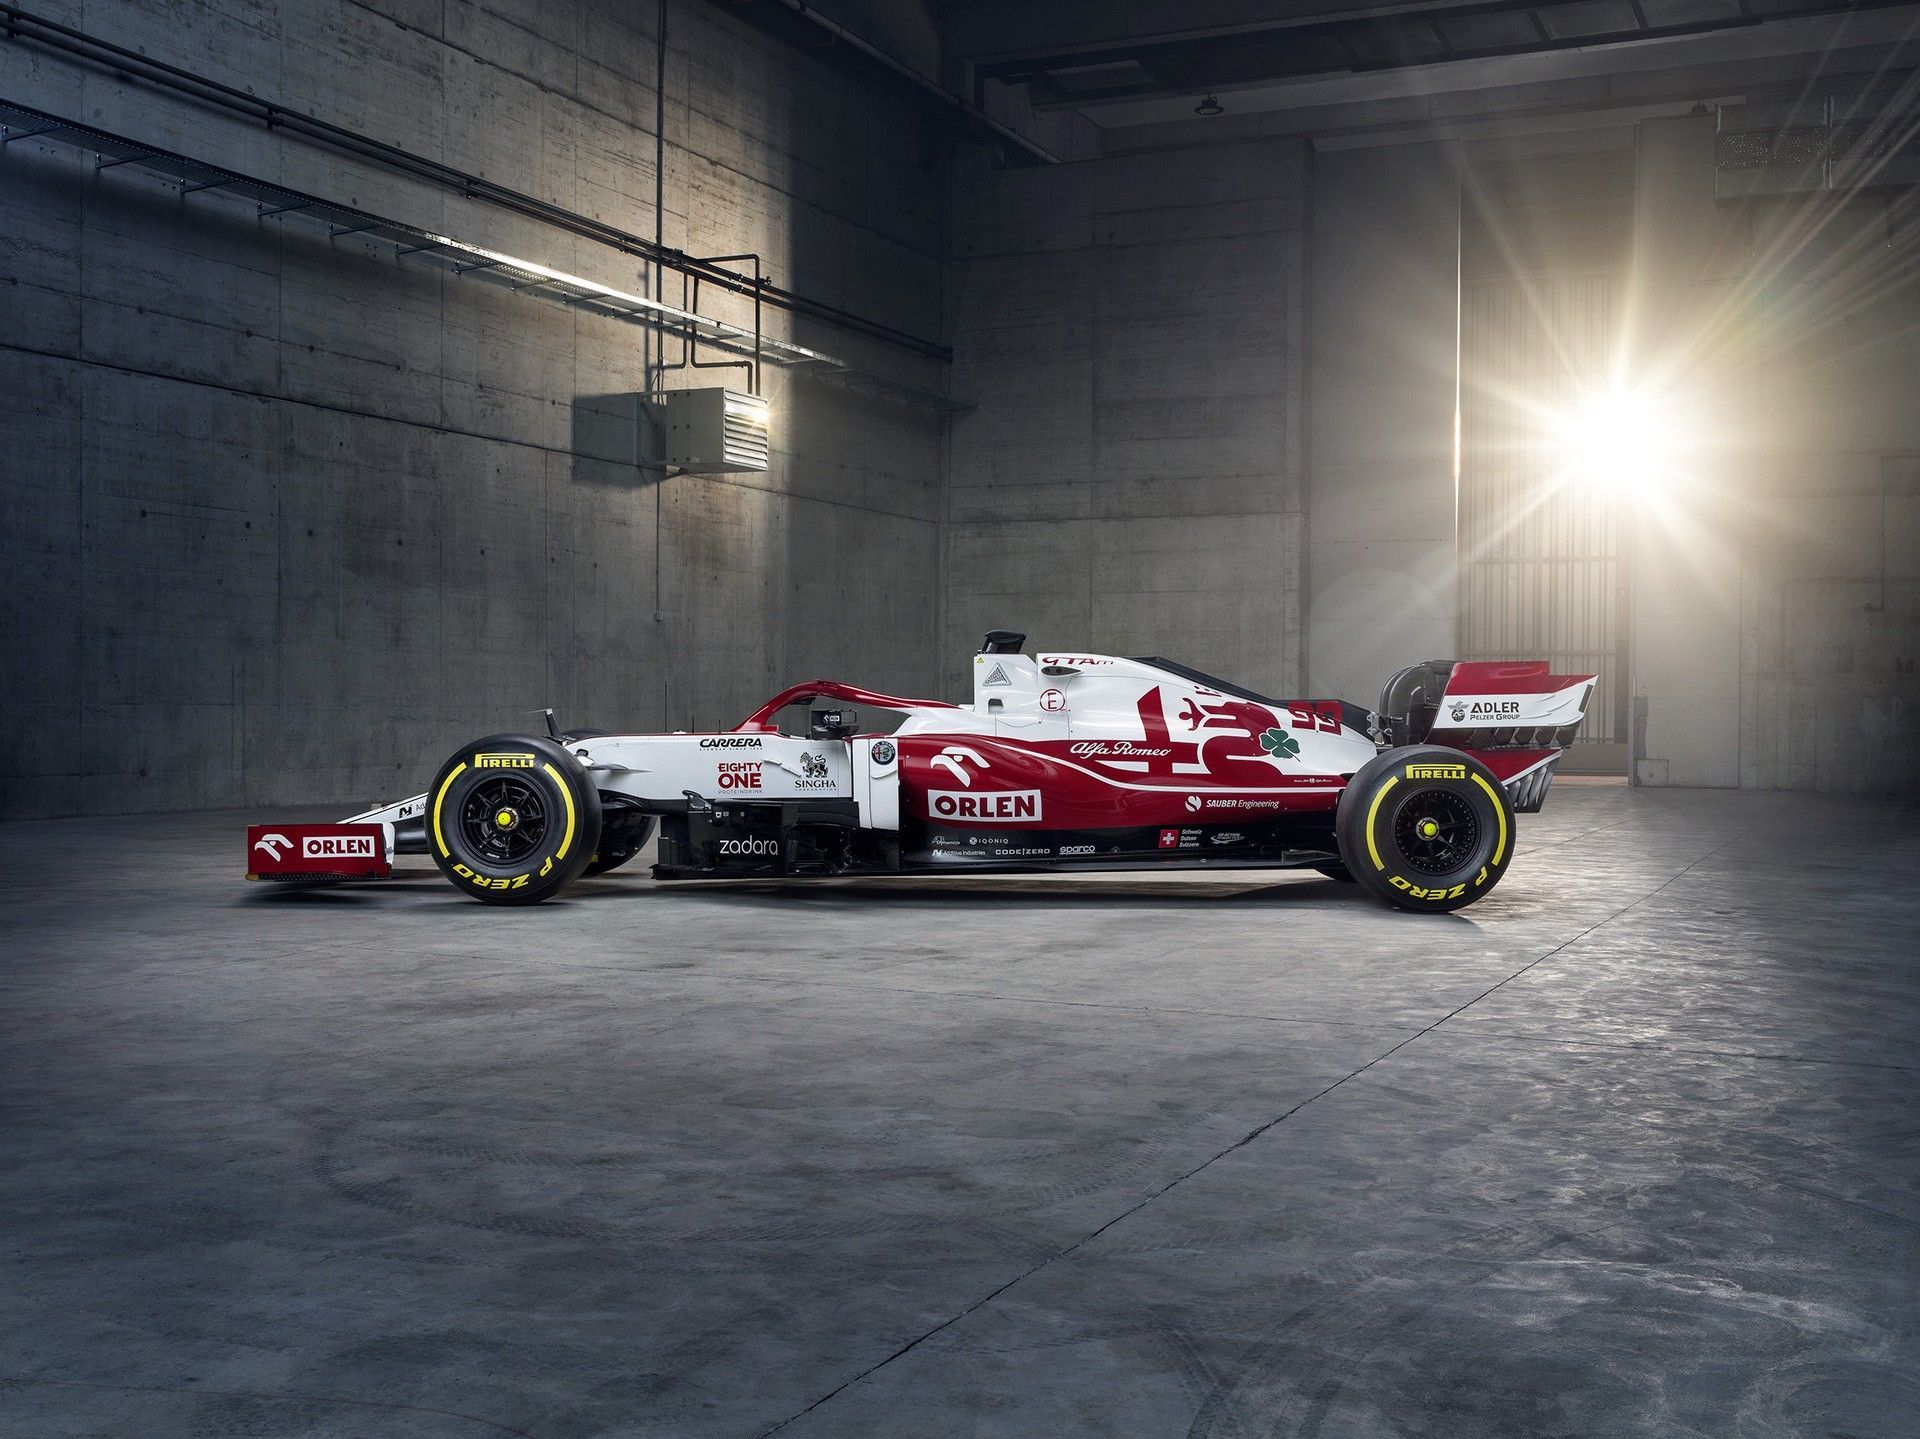 Alfa-Romeo-Racing-ORLEN-C41-7